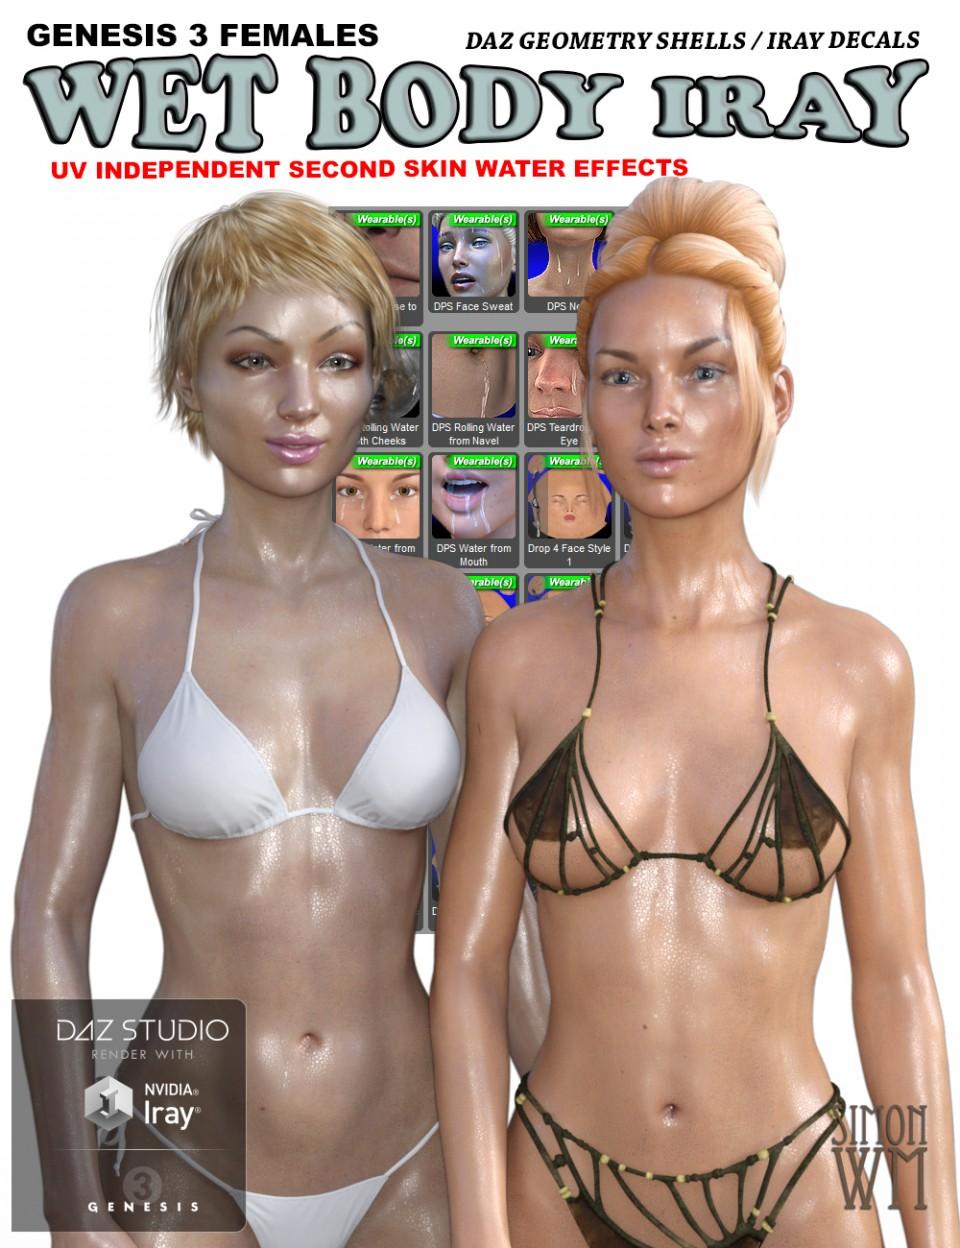 Genesis 3 Female(s) Wet Body Iray_DAZ3D下载站